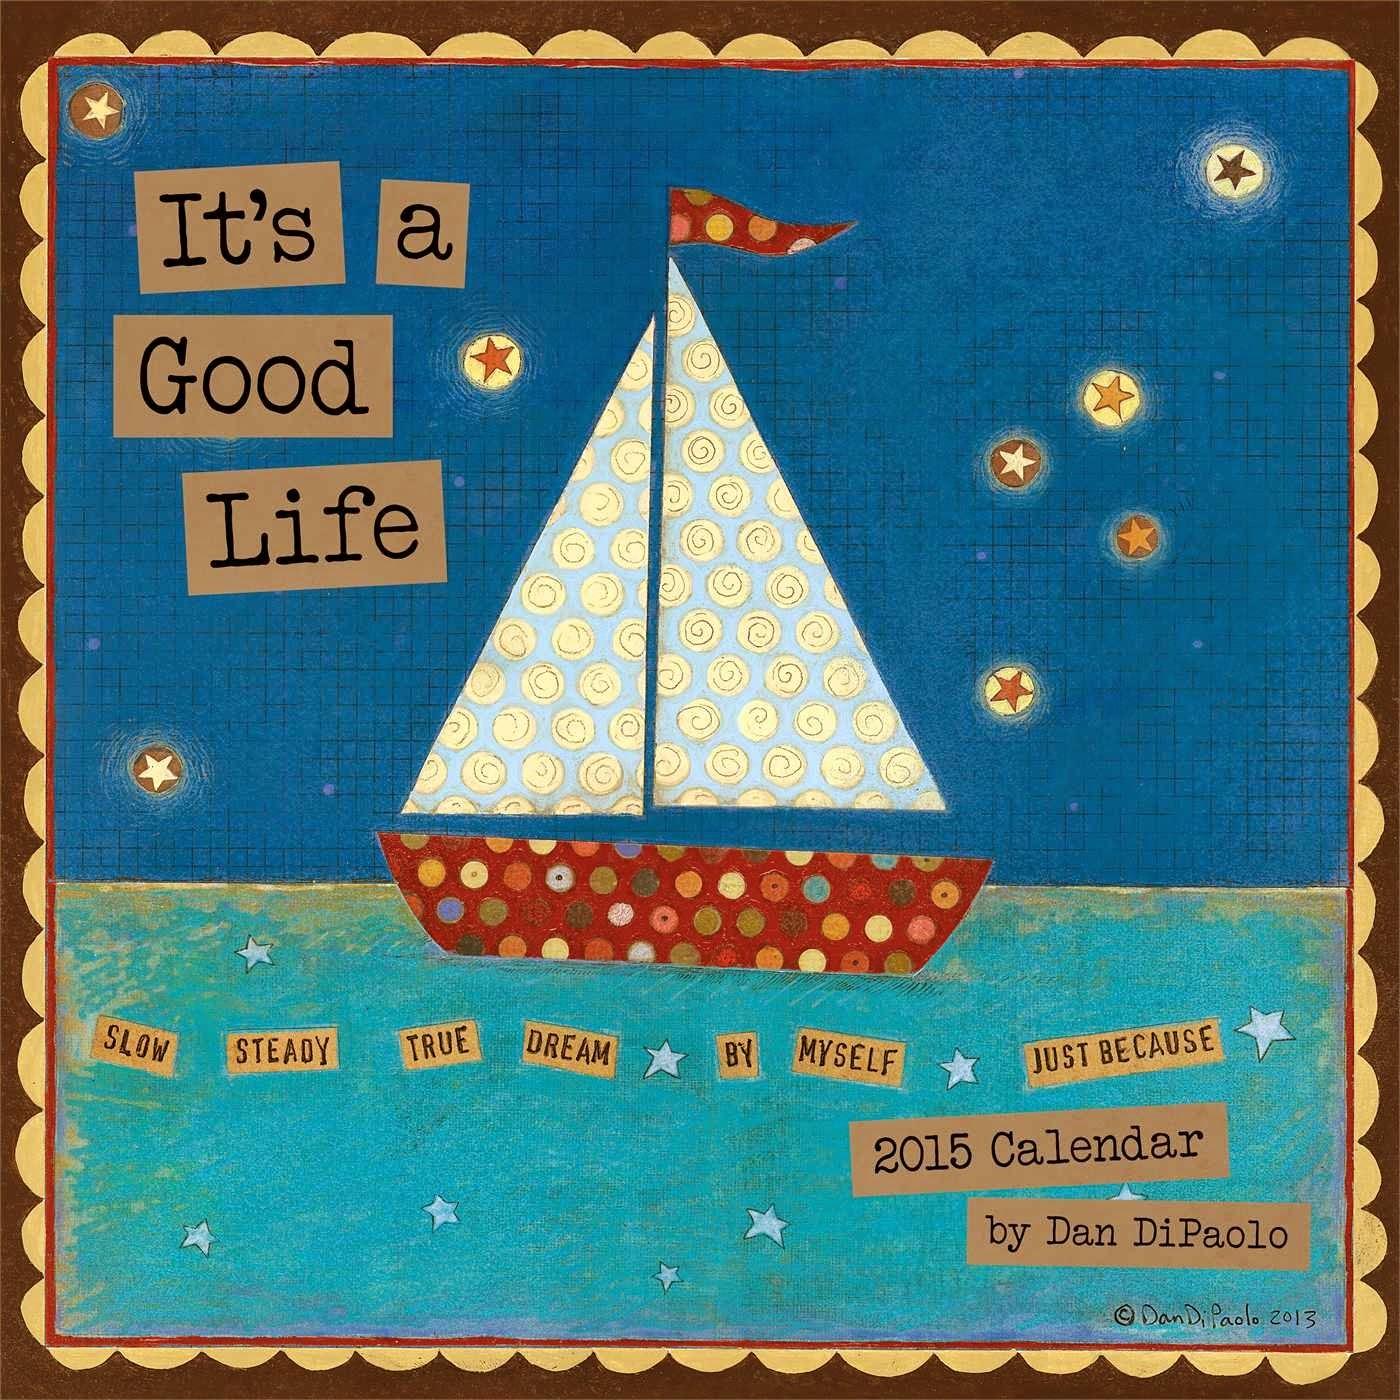 2015 It's a Good Life Calendar